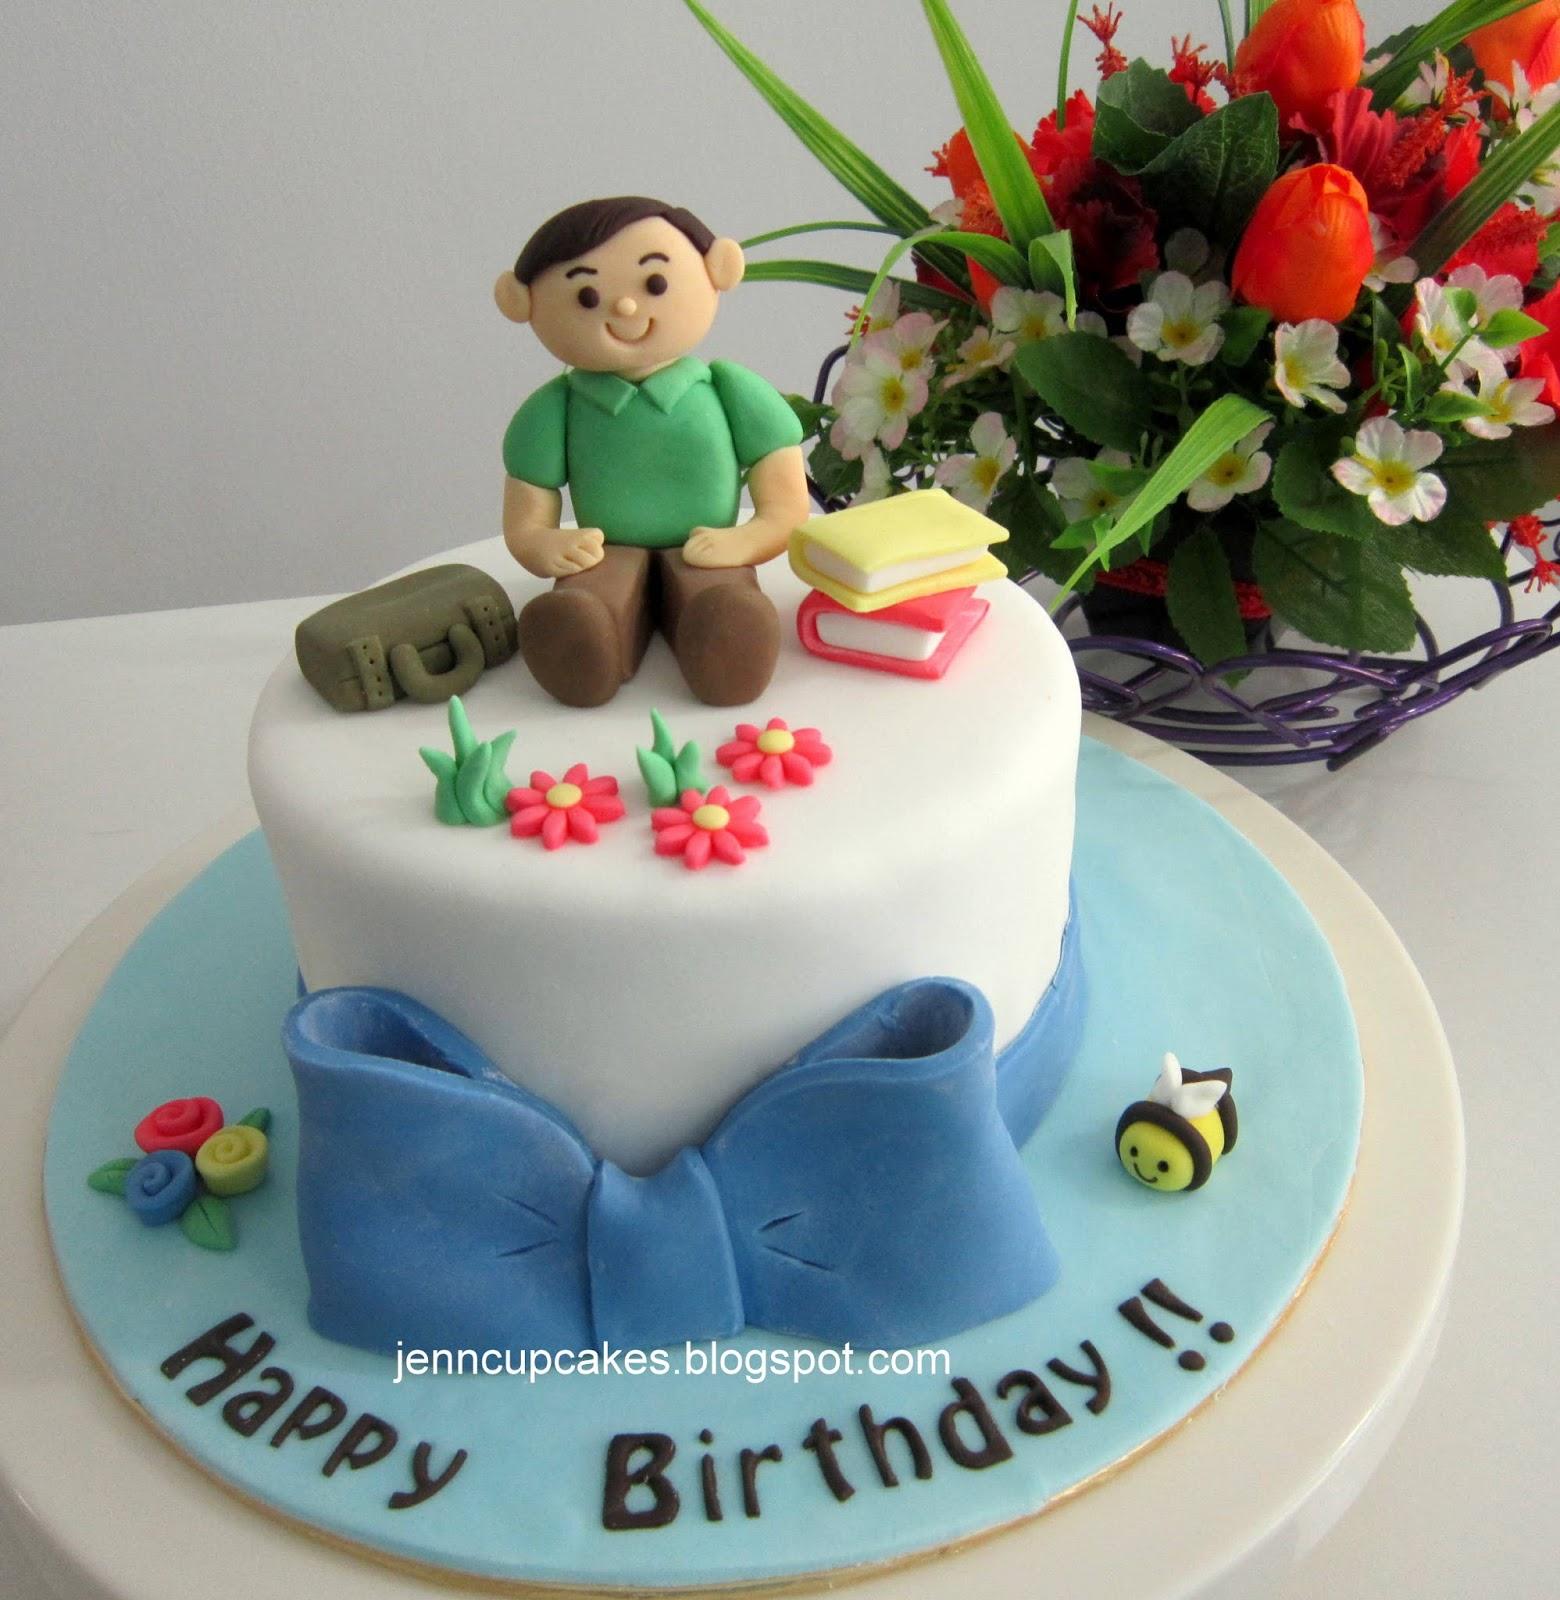 Cake Decorating Class Kl : Jenn Cupcakes & Muffins: One to One Basic Fondant Cake ...